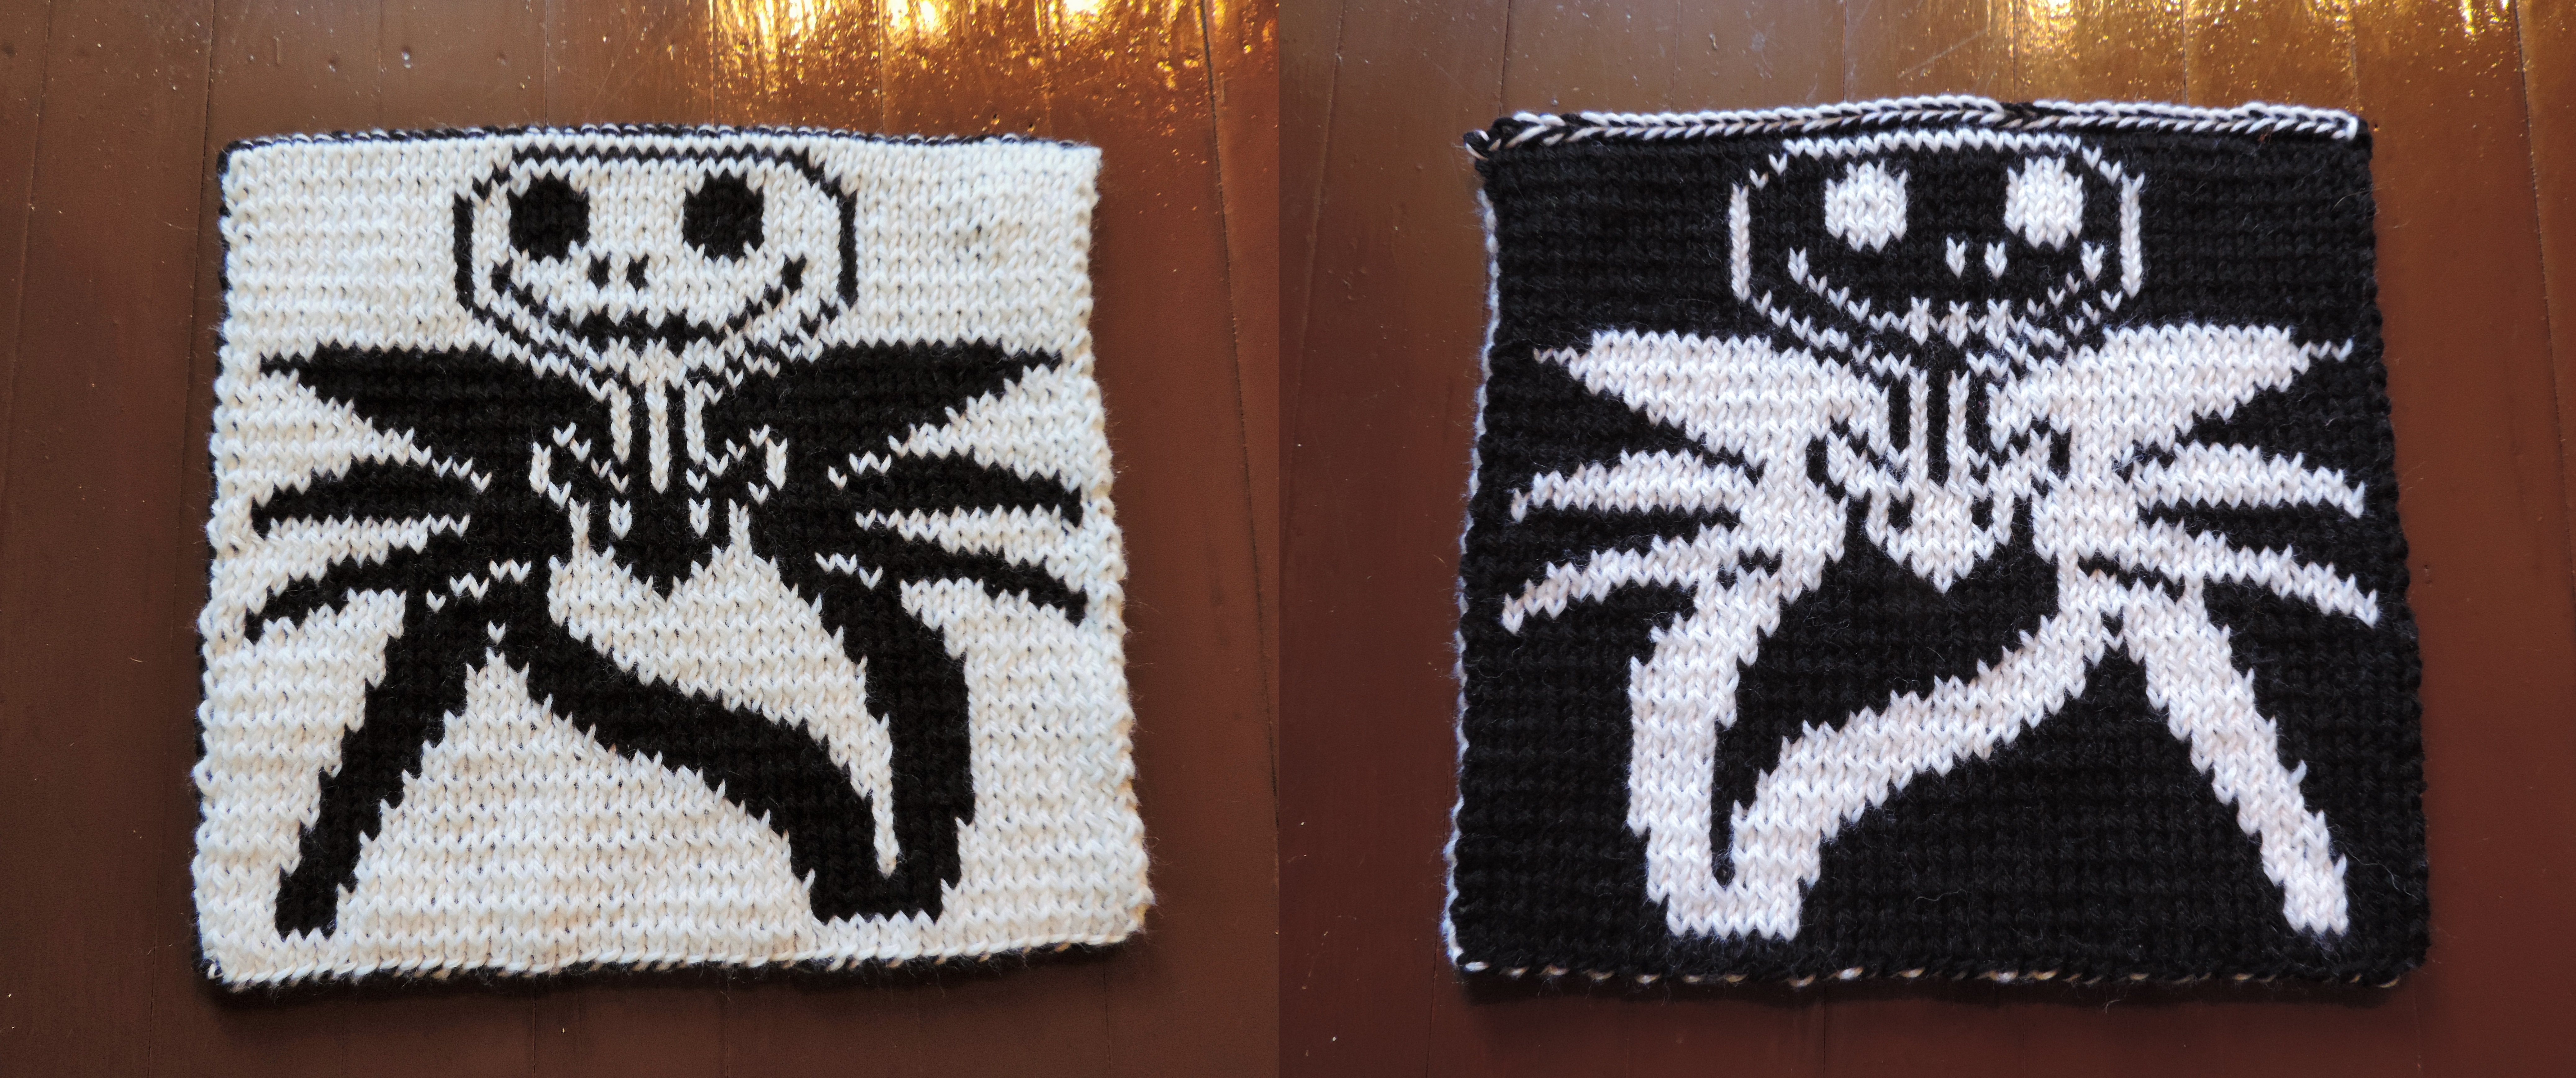 Free Crochet Pattern Of Jack Skellington : 2014 Geek-A-Long: Jack Skellington ? Lattes & Llamas